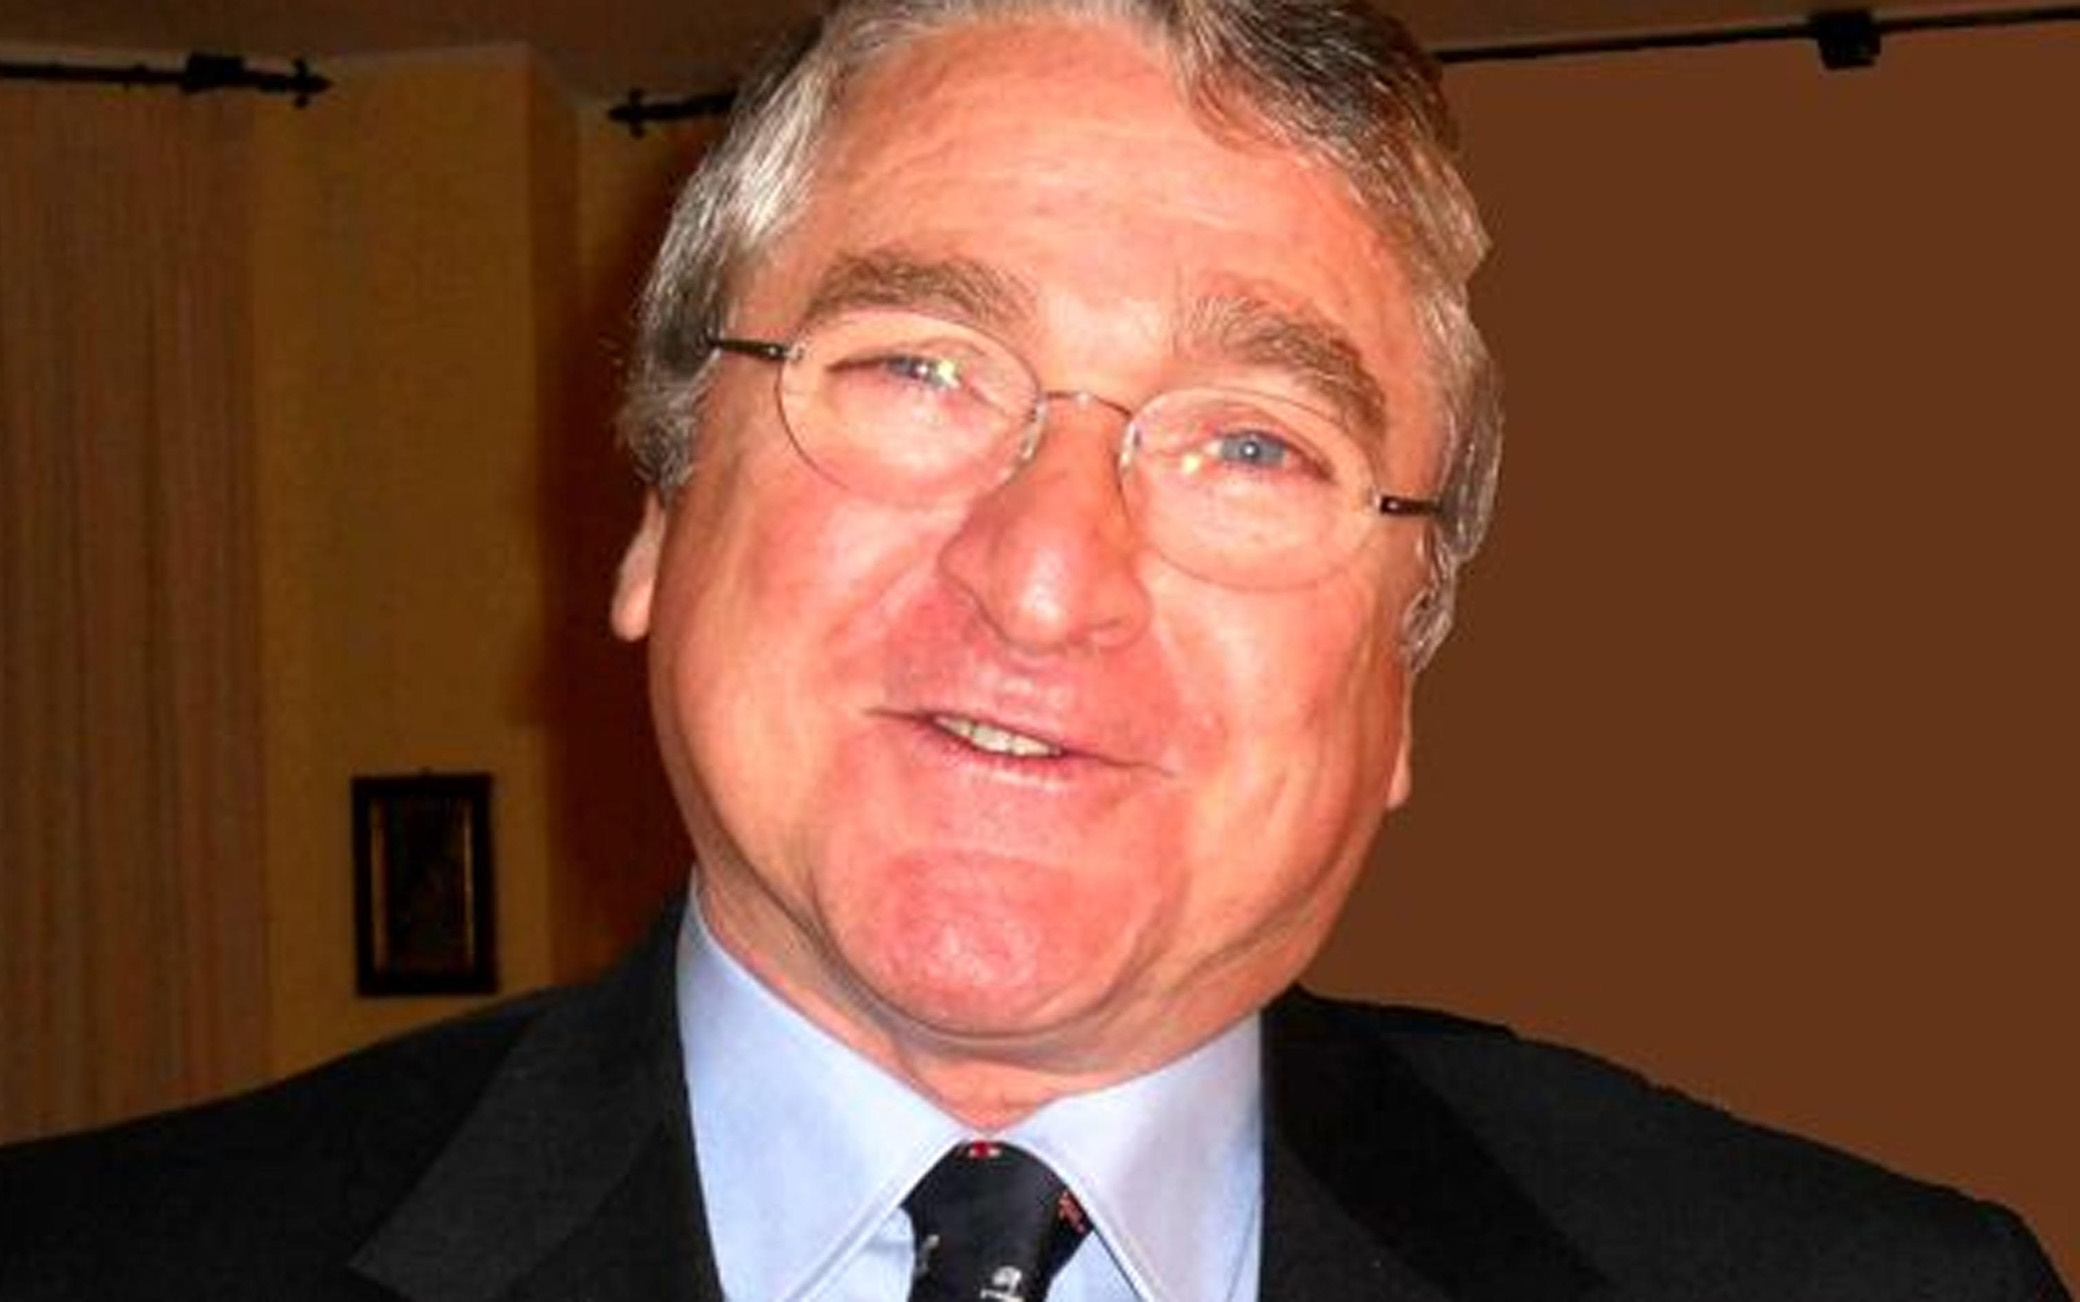 L'ingegnere 74enne Giovanni 'Vanni' Calì, rapito ieri ad Haiti